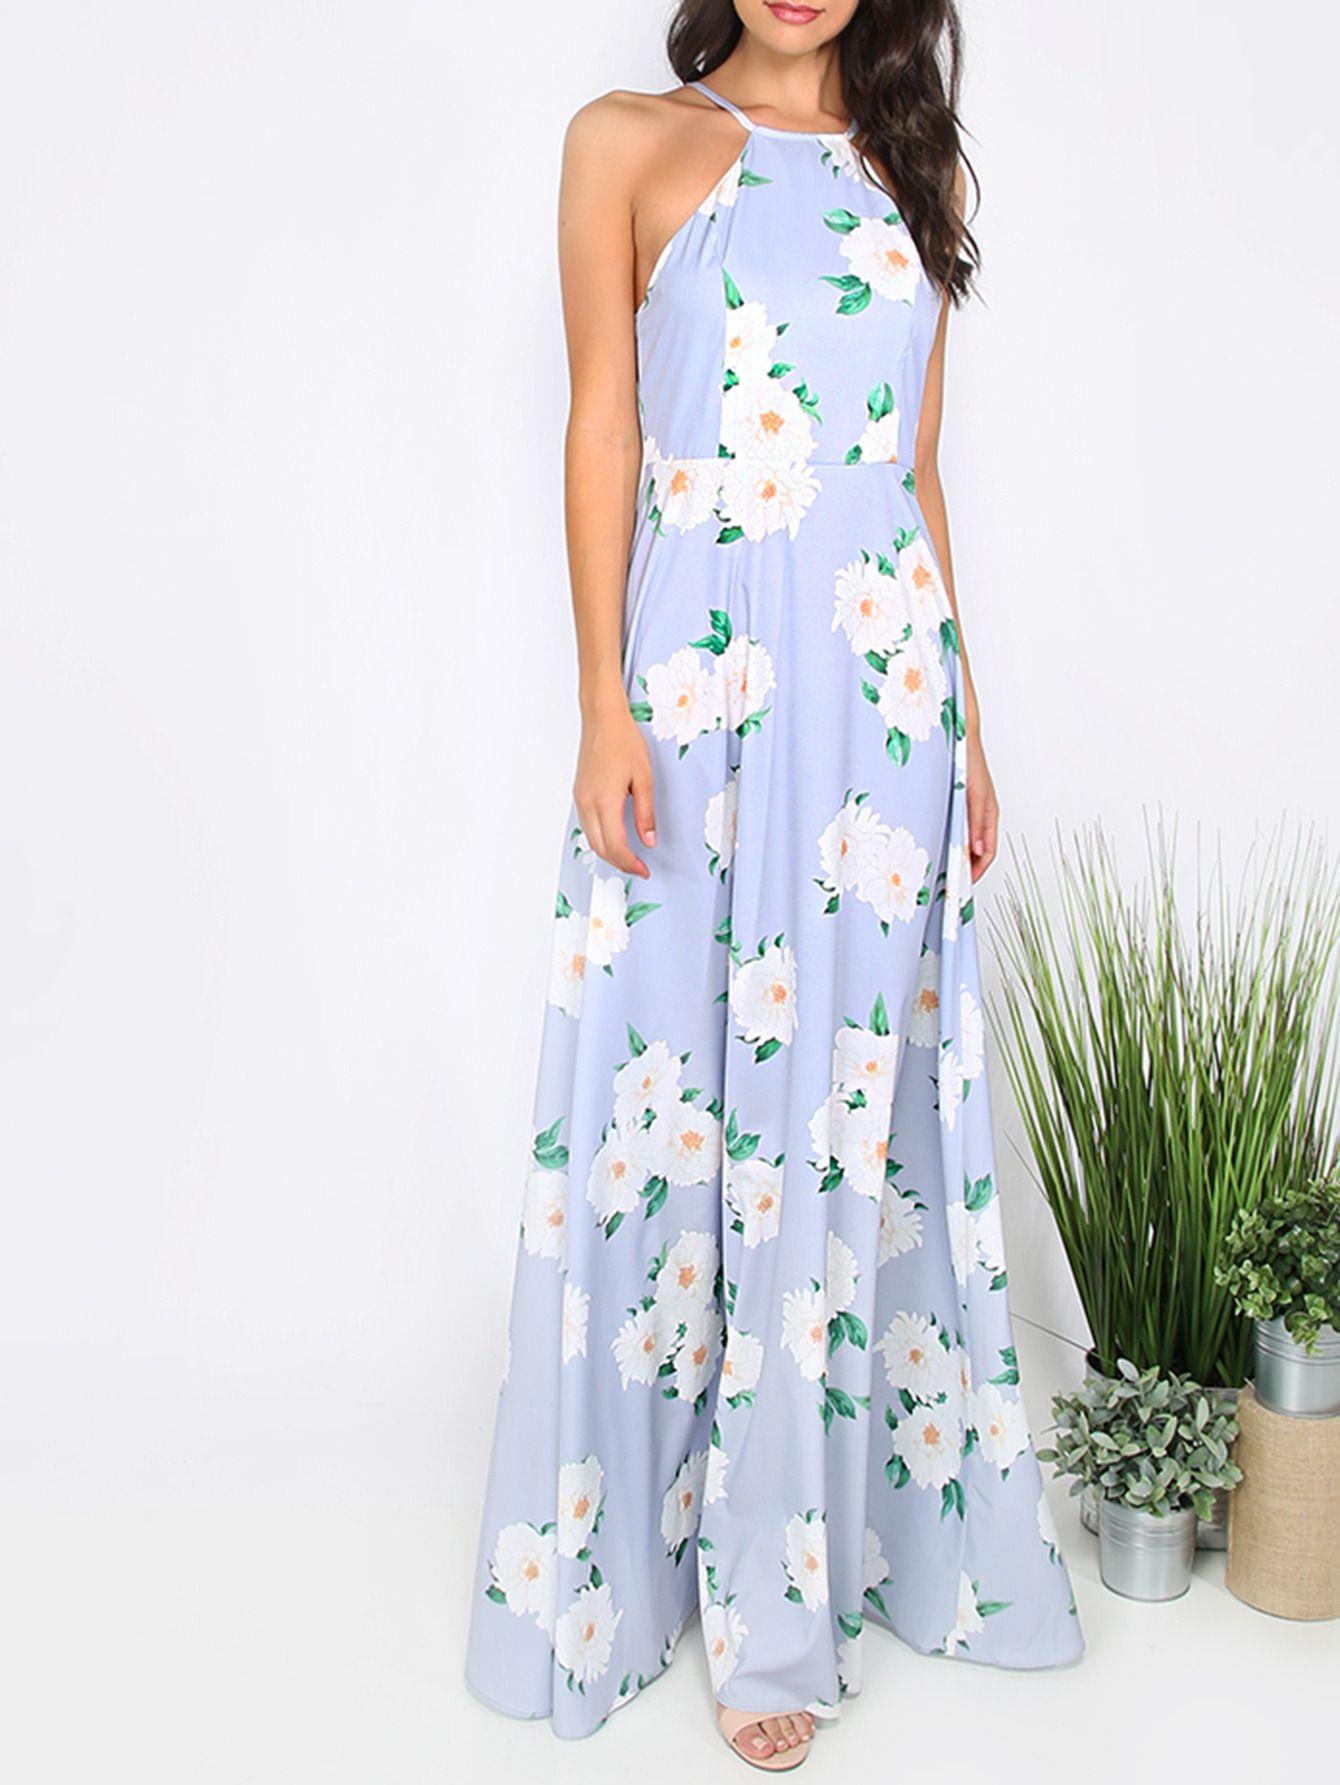 Vestido floral escote halter maxi | vestits | Pinterest | Vestiditos ...